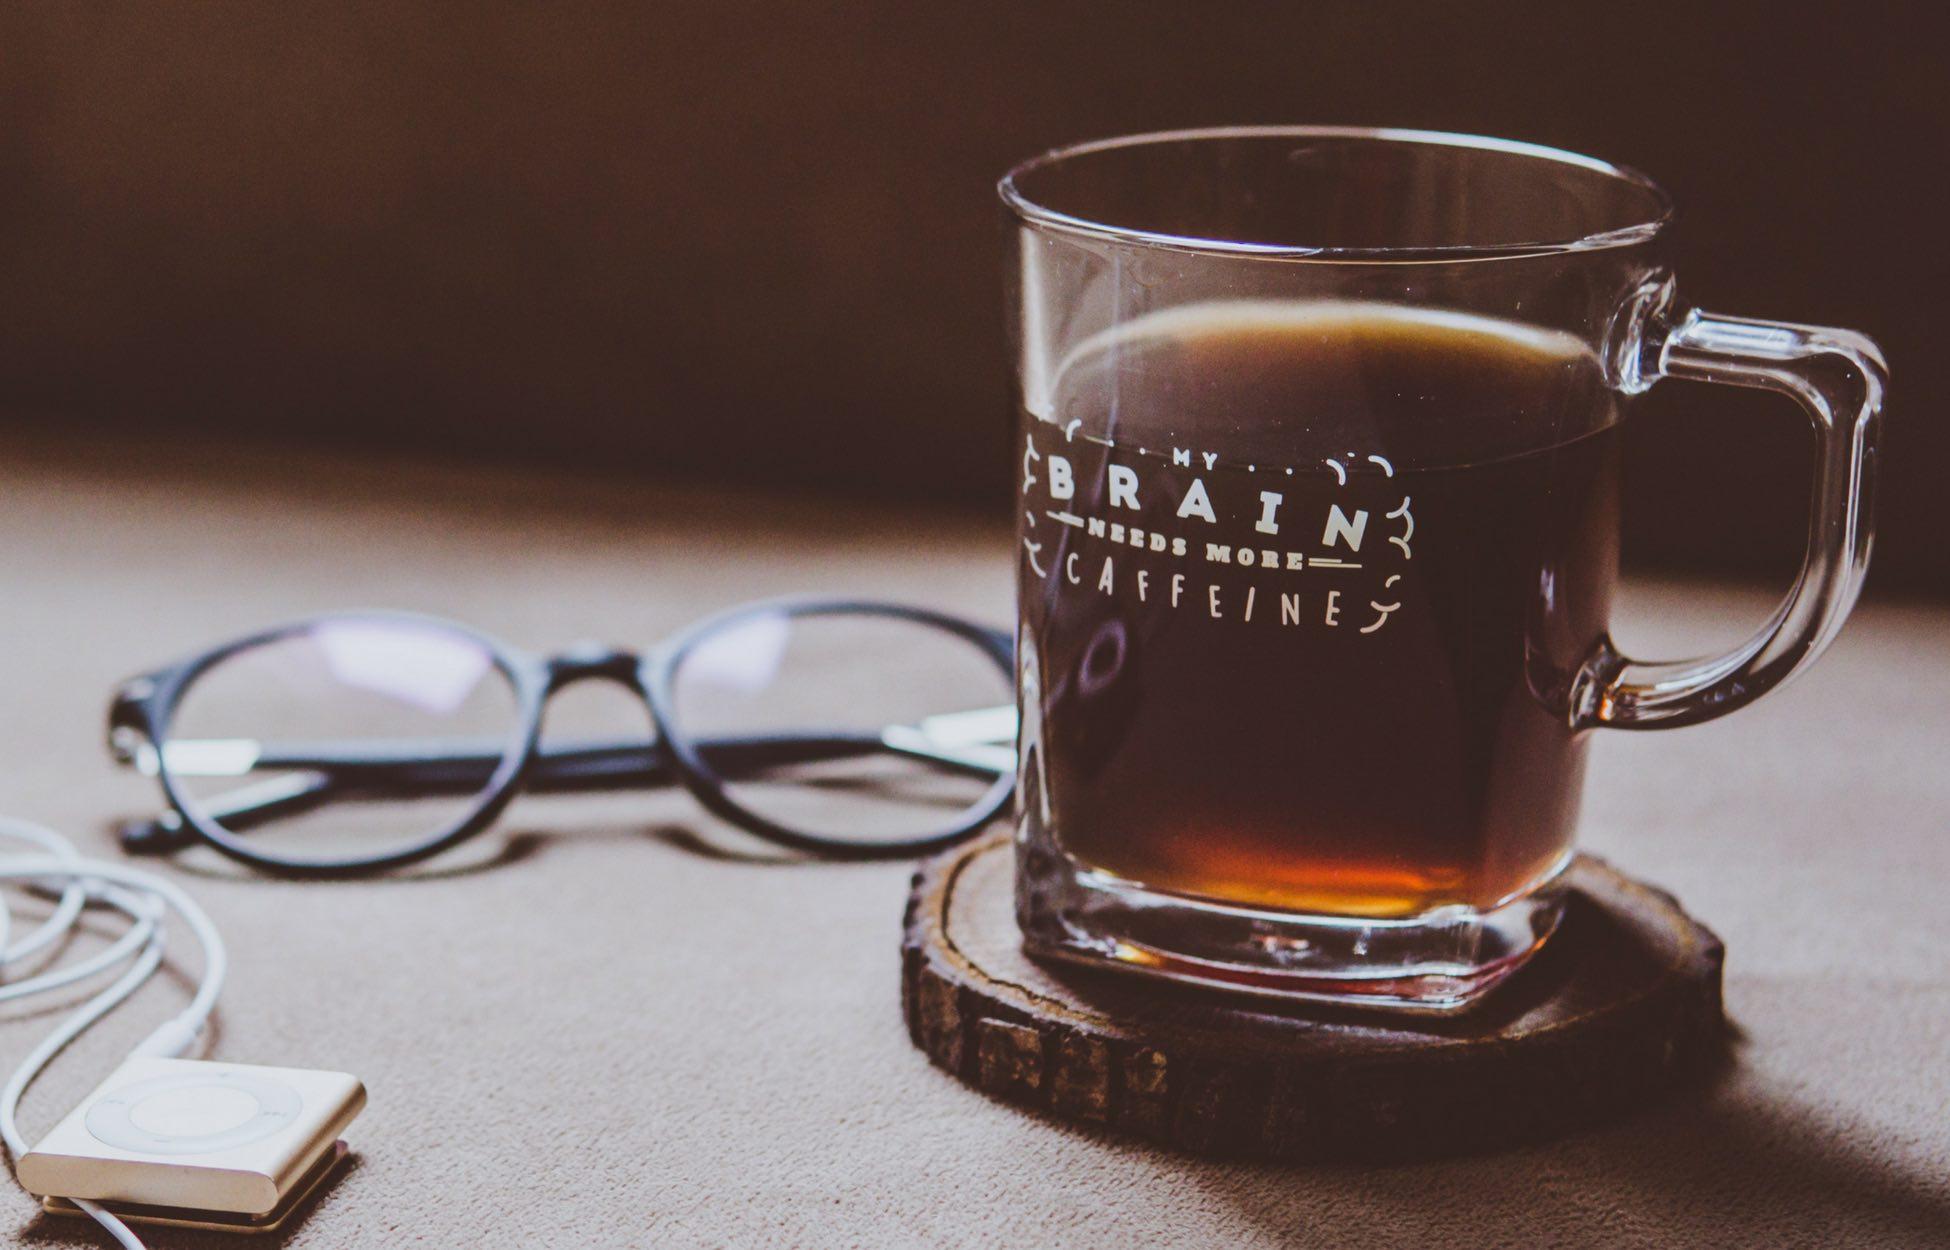 coffee glass with 'brain needs more caffeine' written on